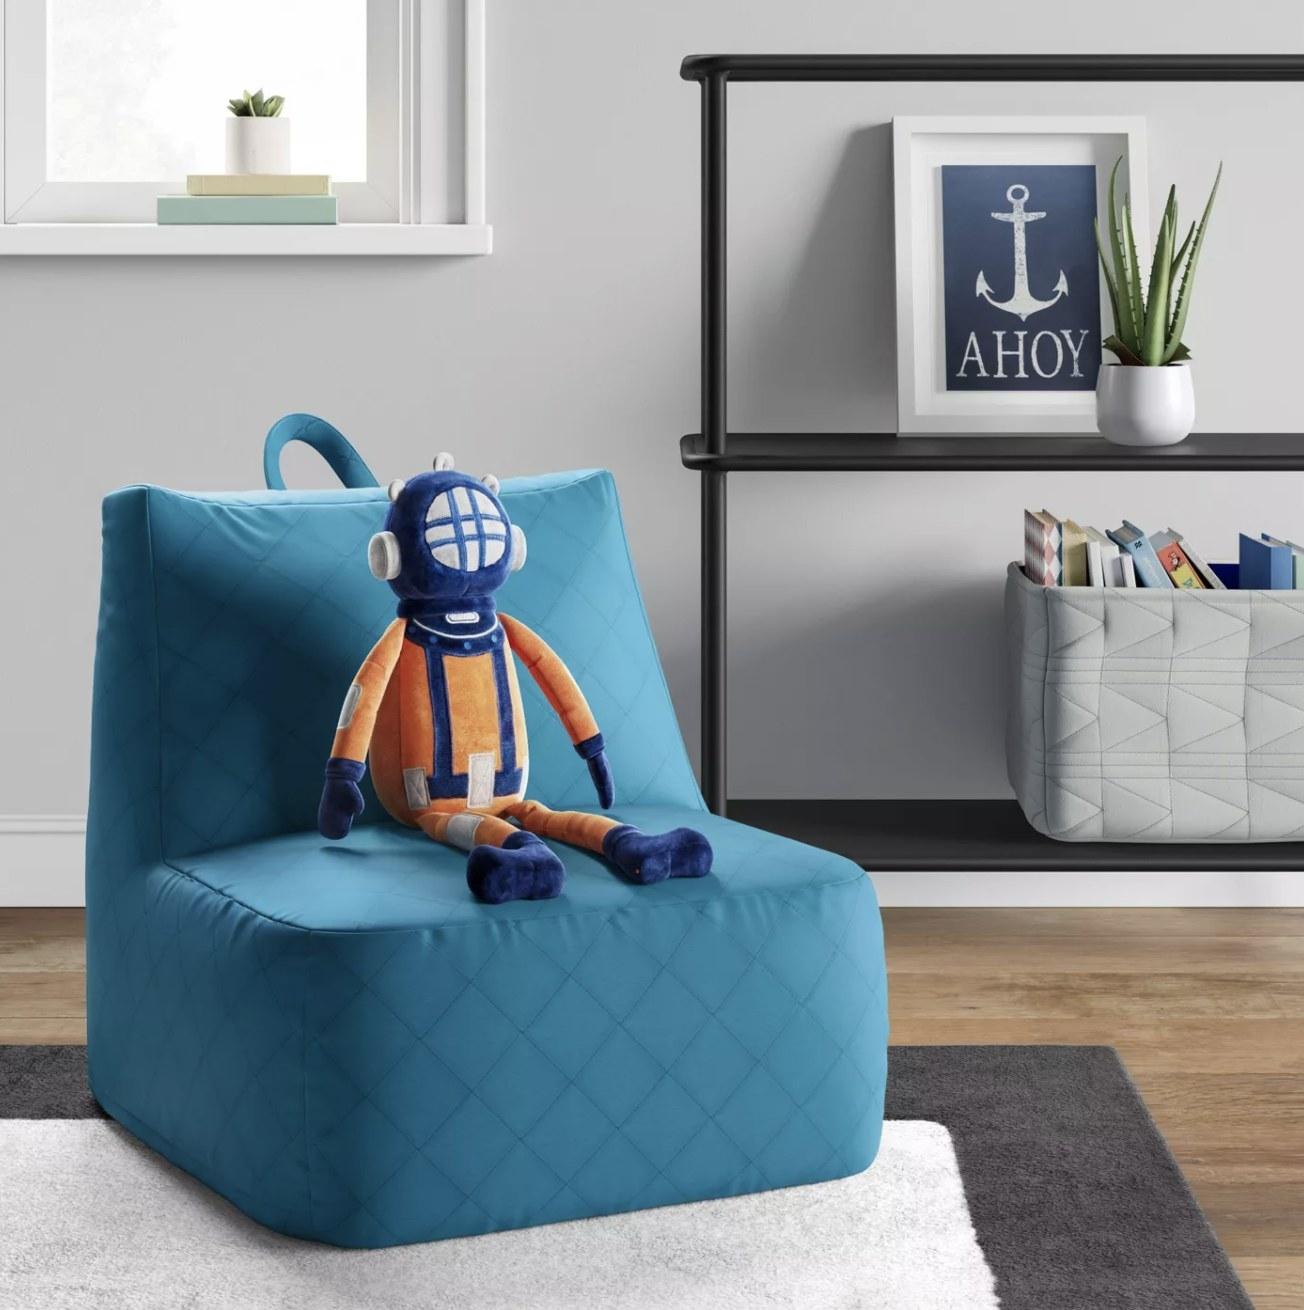 A pale blue lounge chair